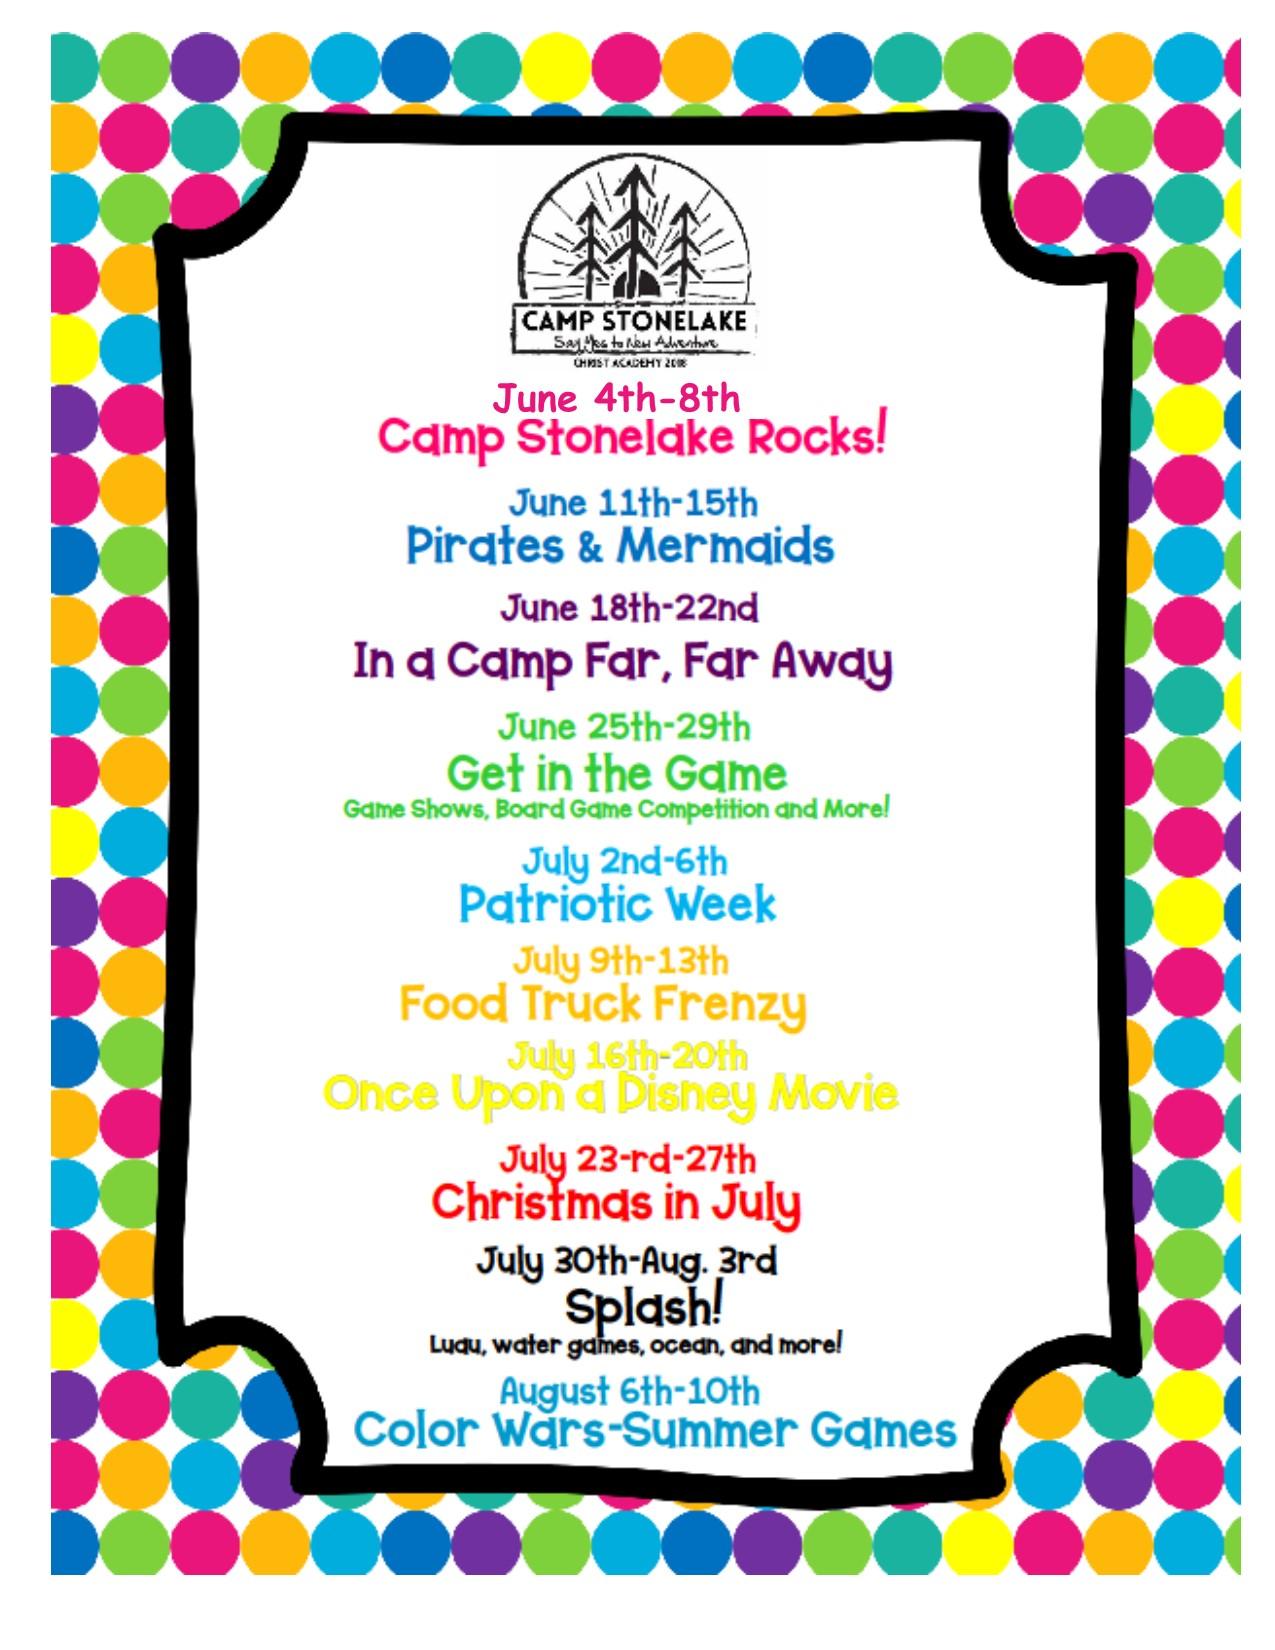 Camp Stonelake Wichita Falls TX 2018 Camp Themes.jpg